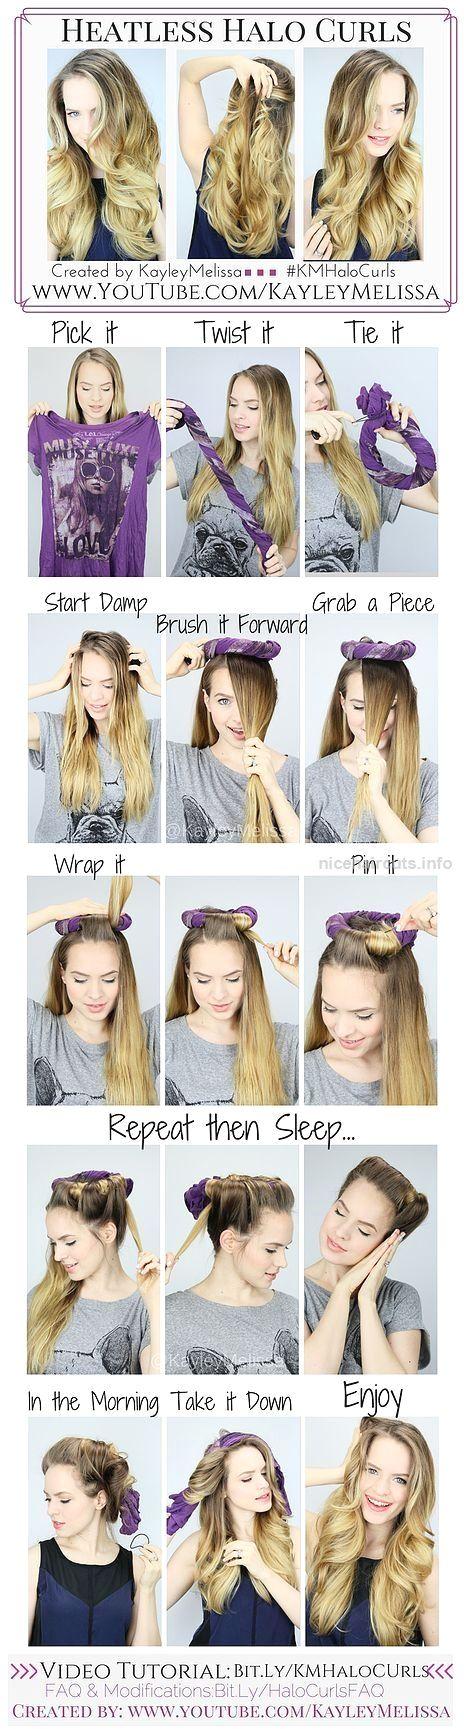 Curly hairstyles tutorials - Heatless Halo Curls Hair Tutorial Hair Long Hair Curly Hair Diy Hair Hairstyles Hair Tutorials Easy